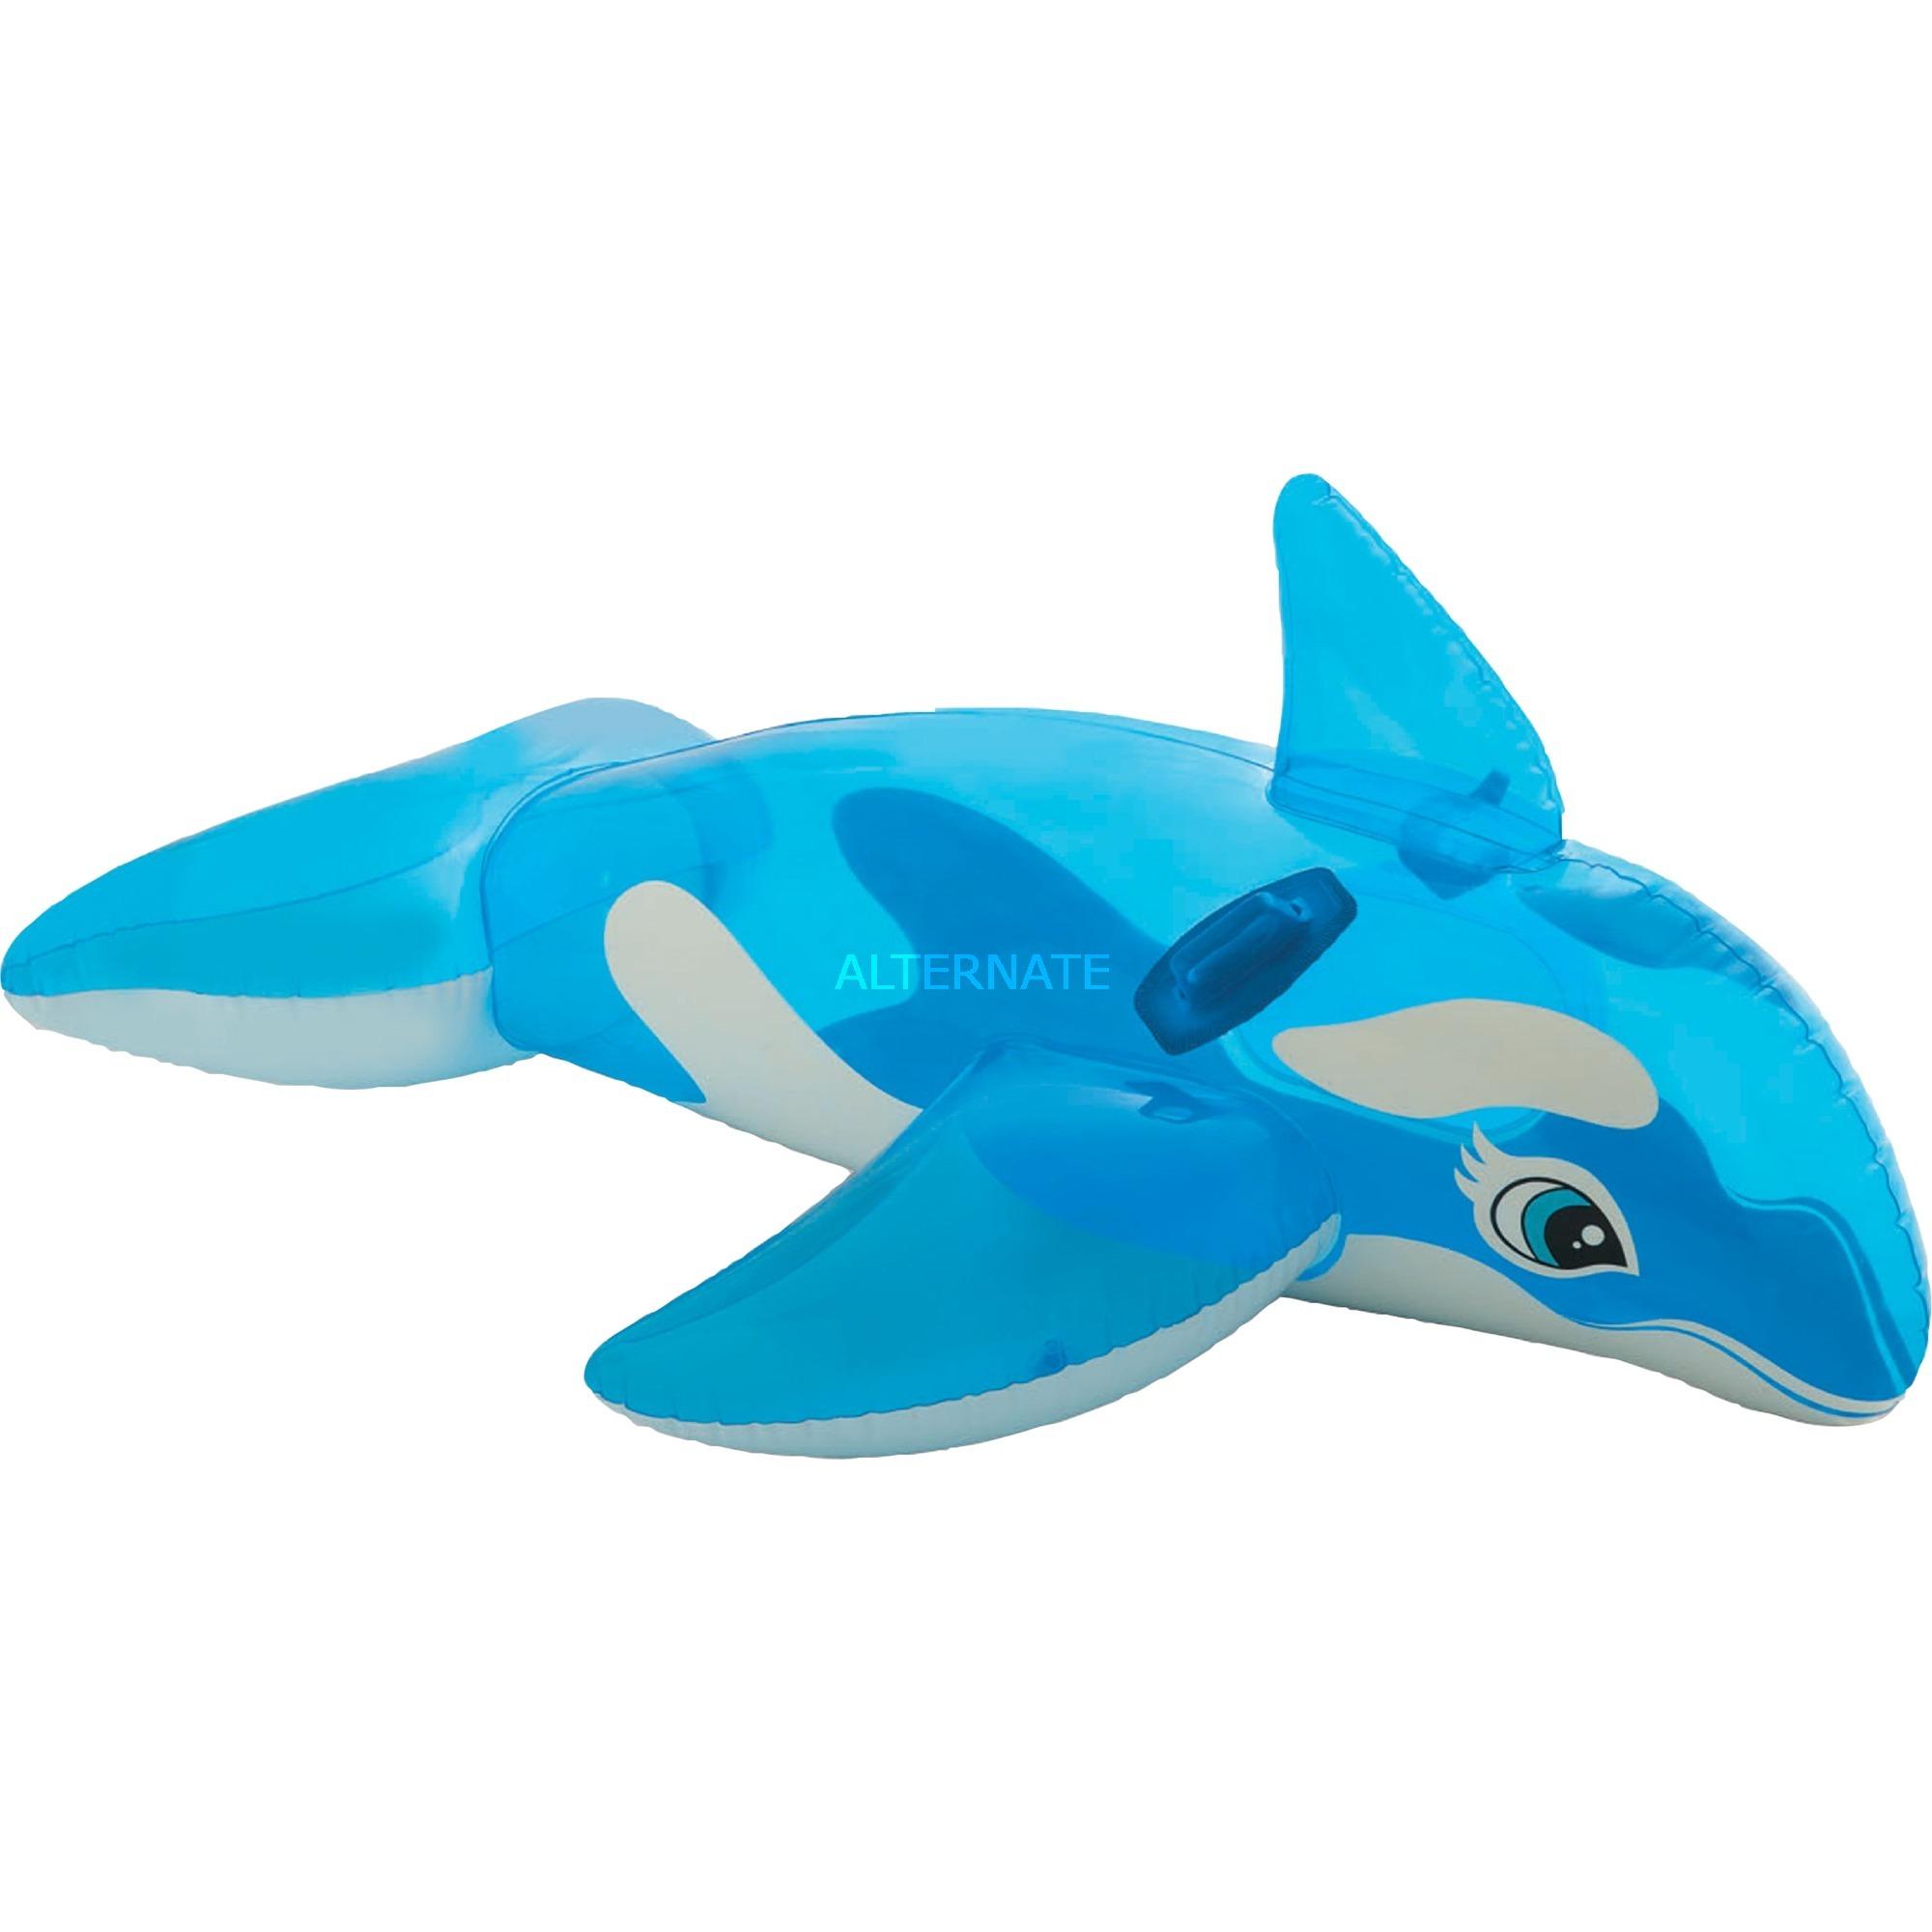 58523NP Piscina juguete inflable, Animal flotante